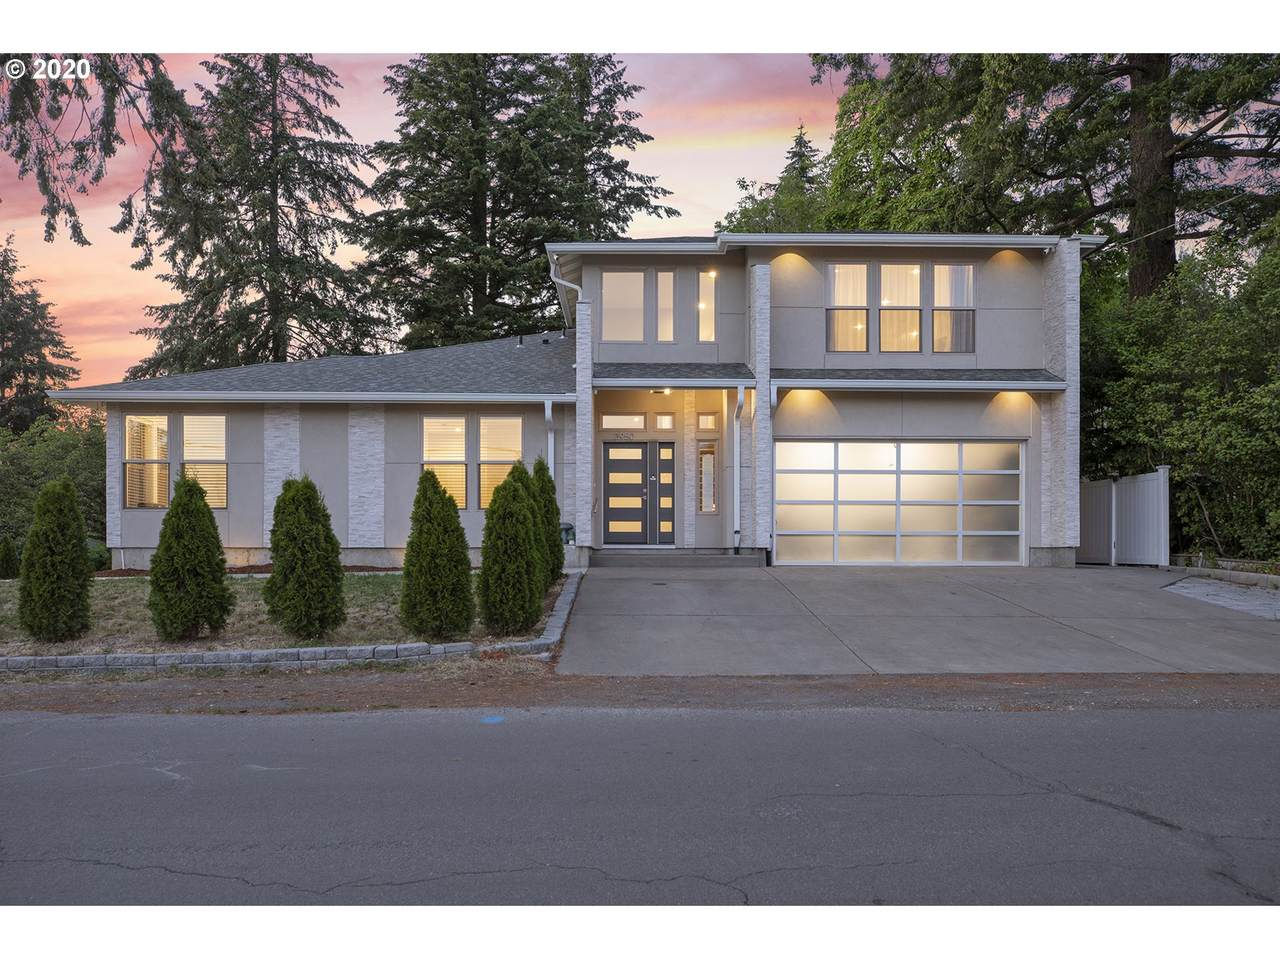 3950 Laurelwood Ave - Photo 1